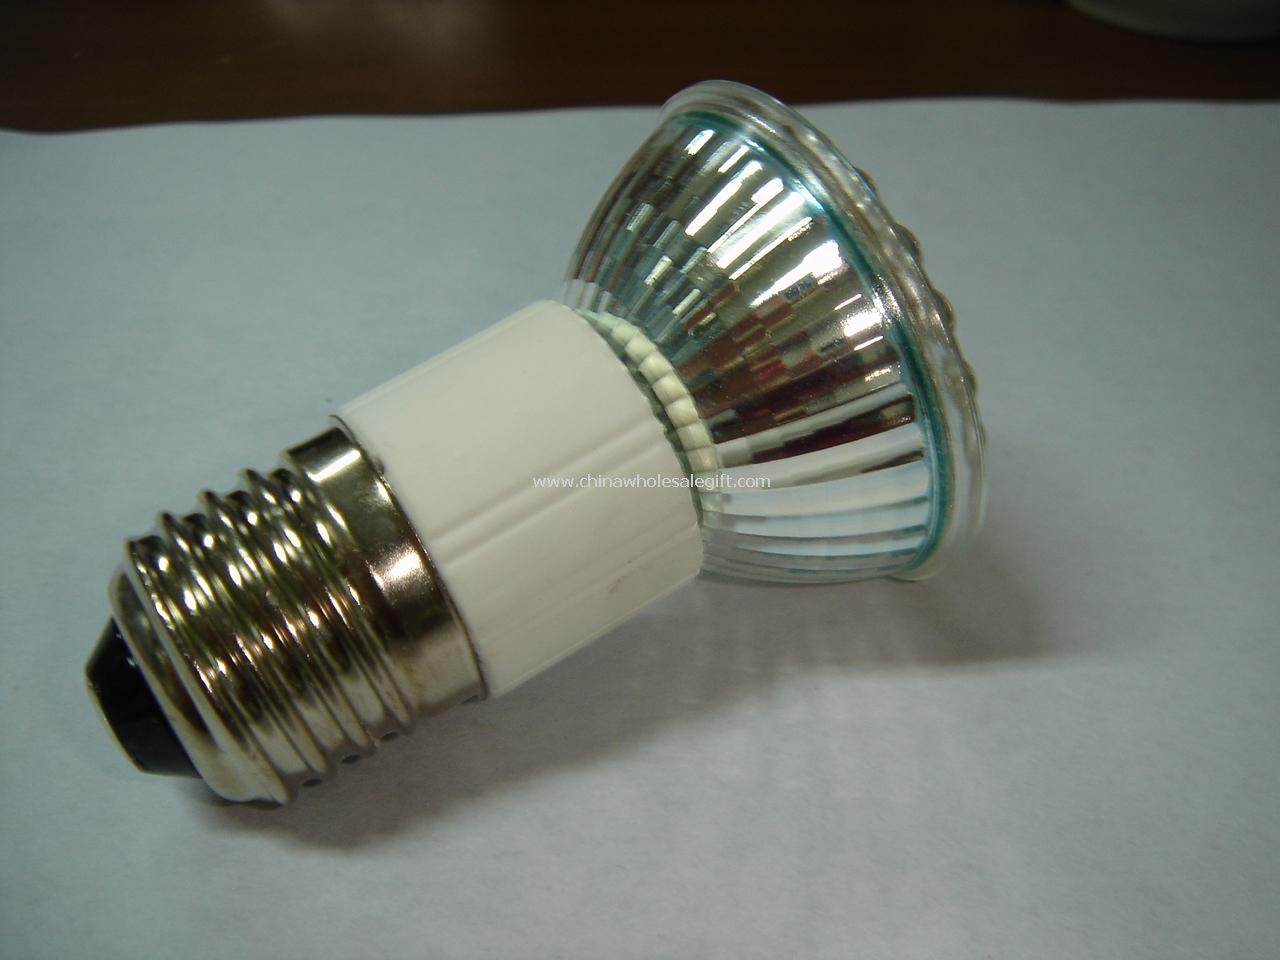 Plastic and Glass LED Spot Light